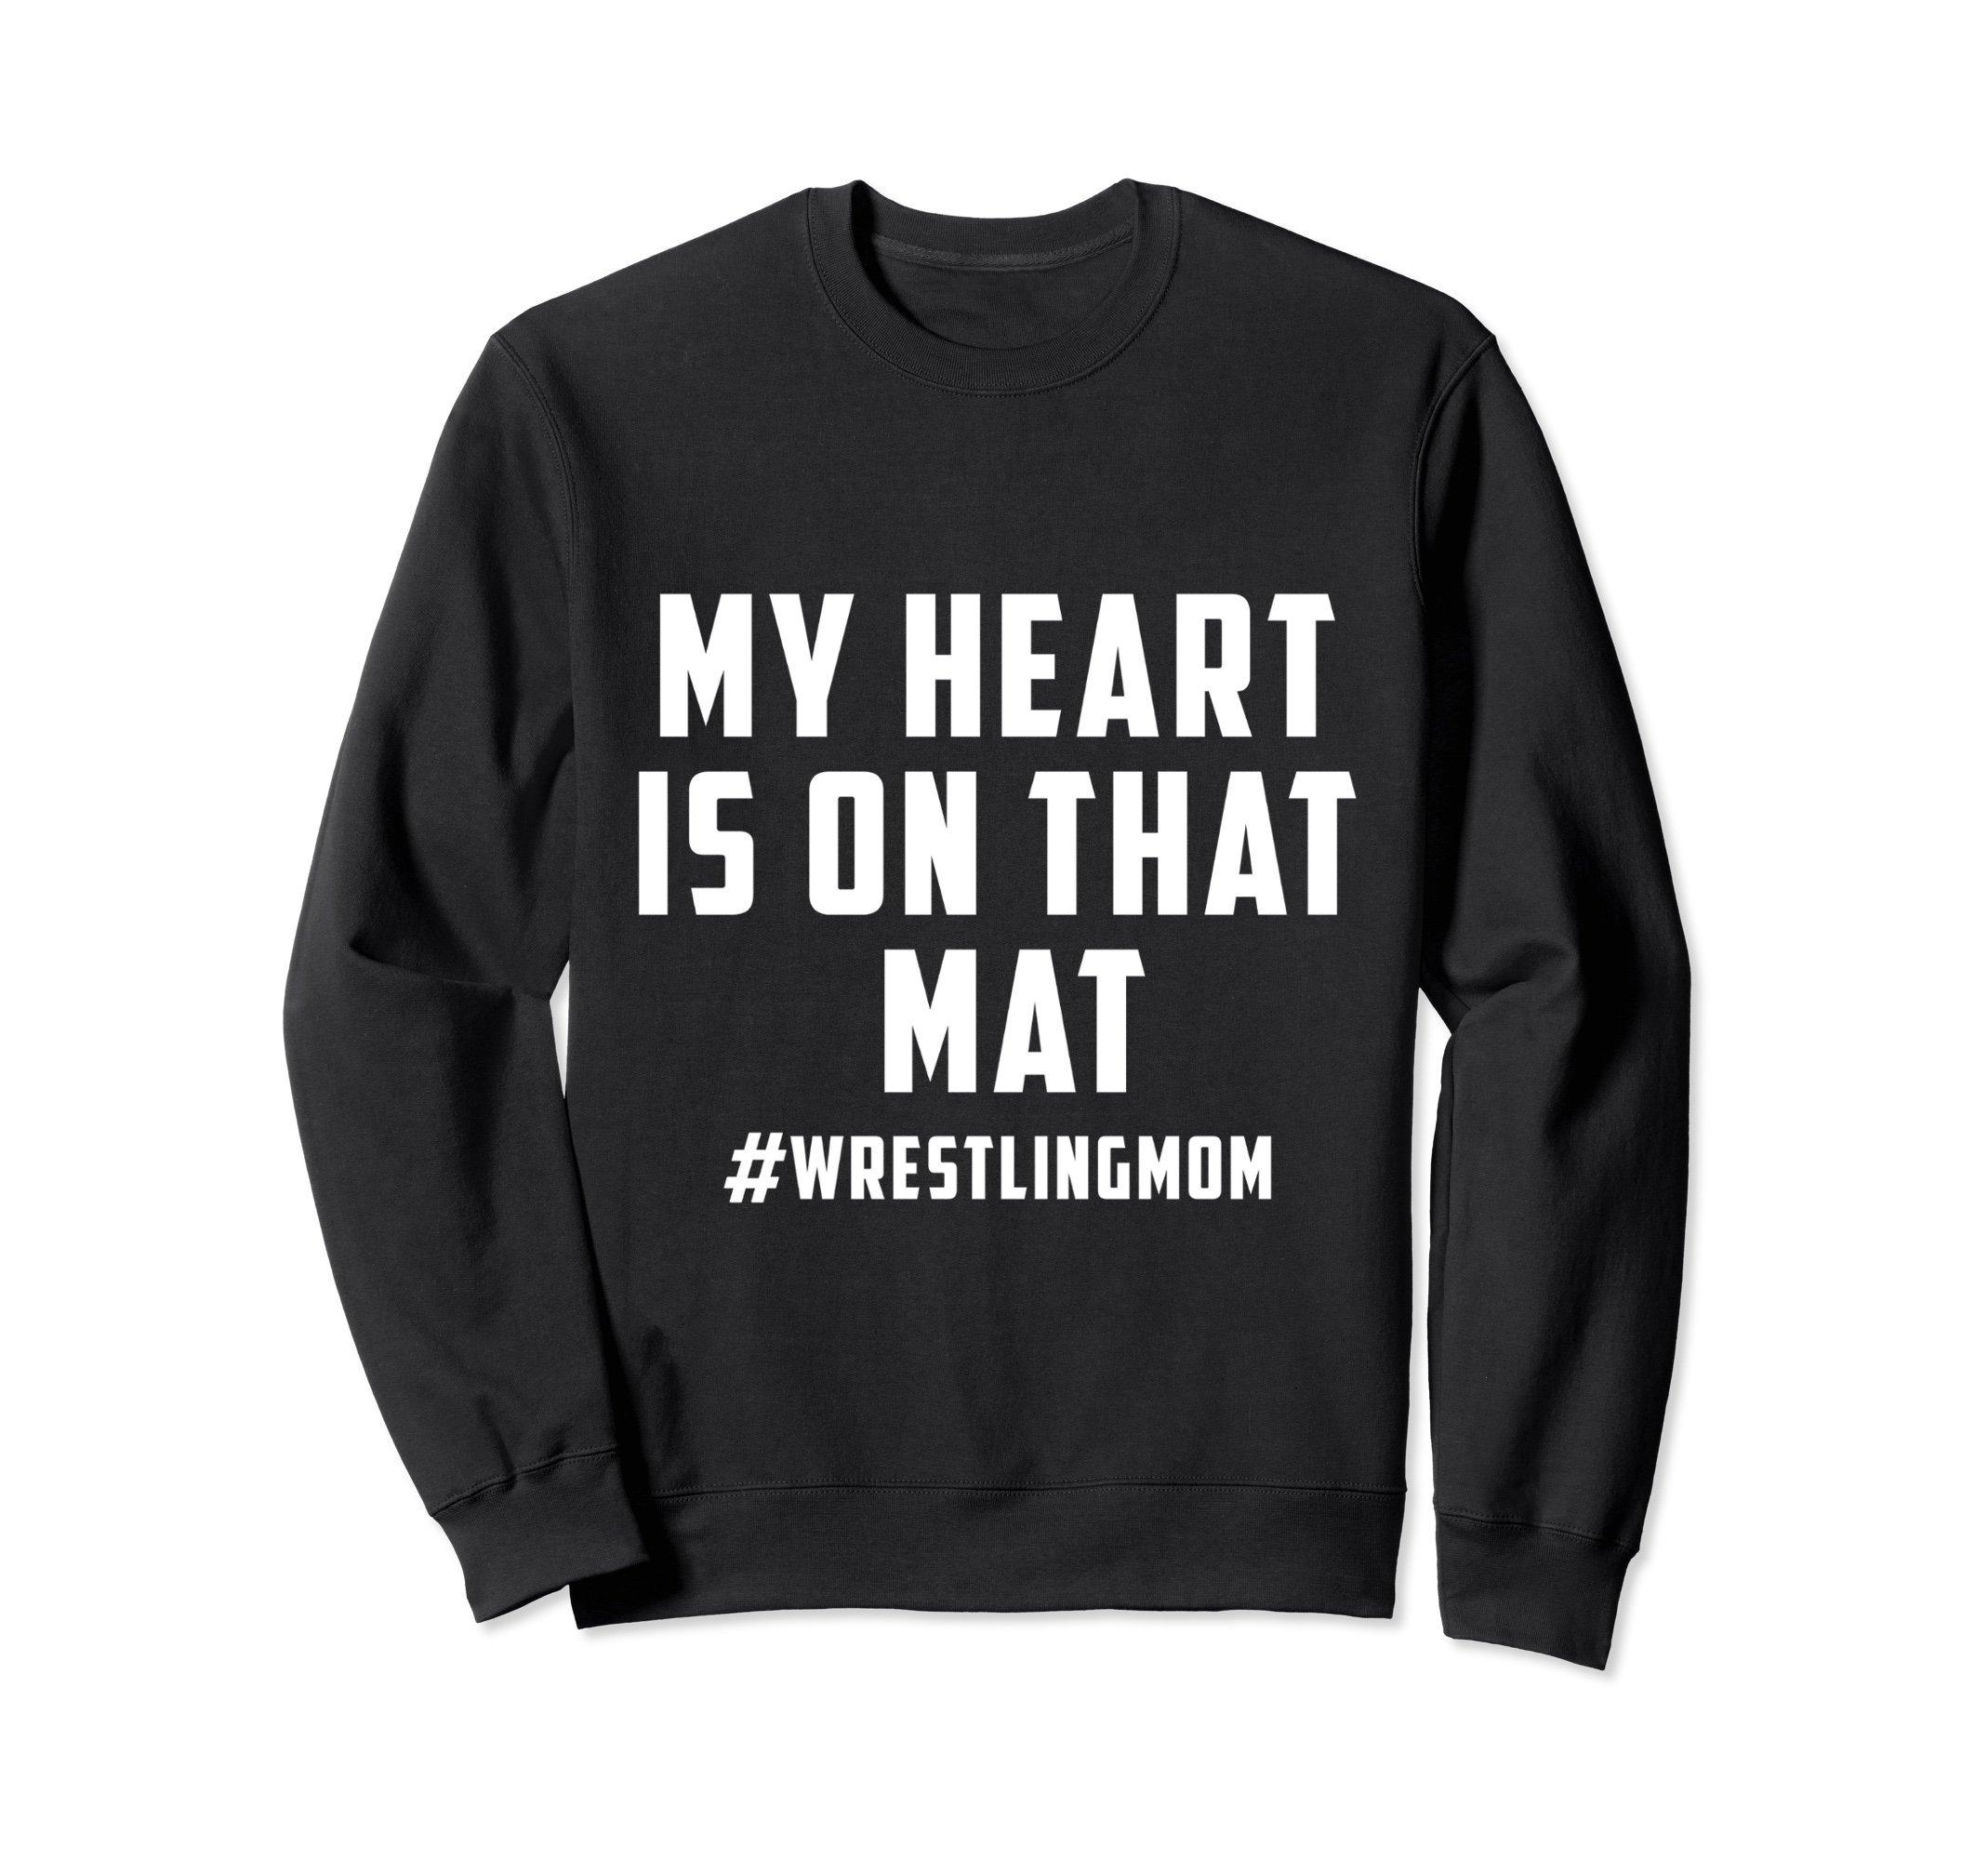 Unisex My Heart Is On That Mat Wrestling Mom Sweatshirt Small Black by My Heart Is On That Mat Sweatshirt